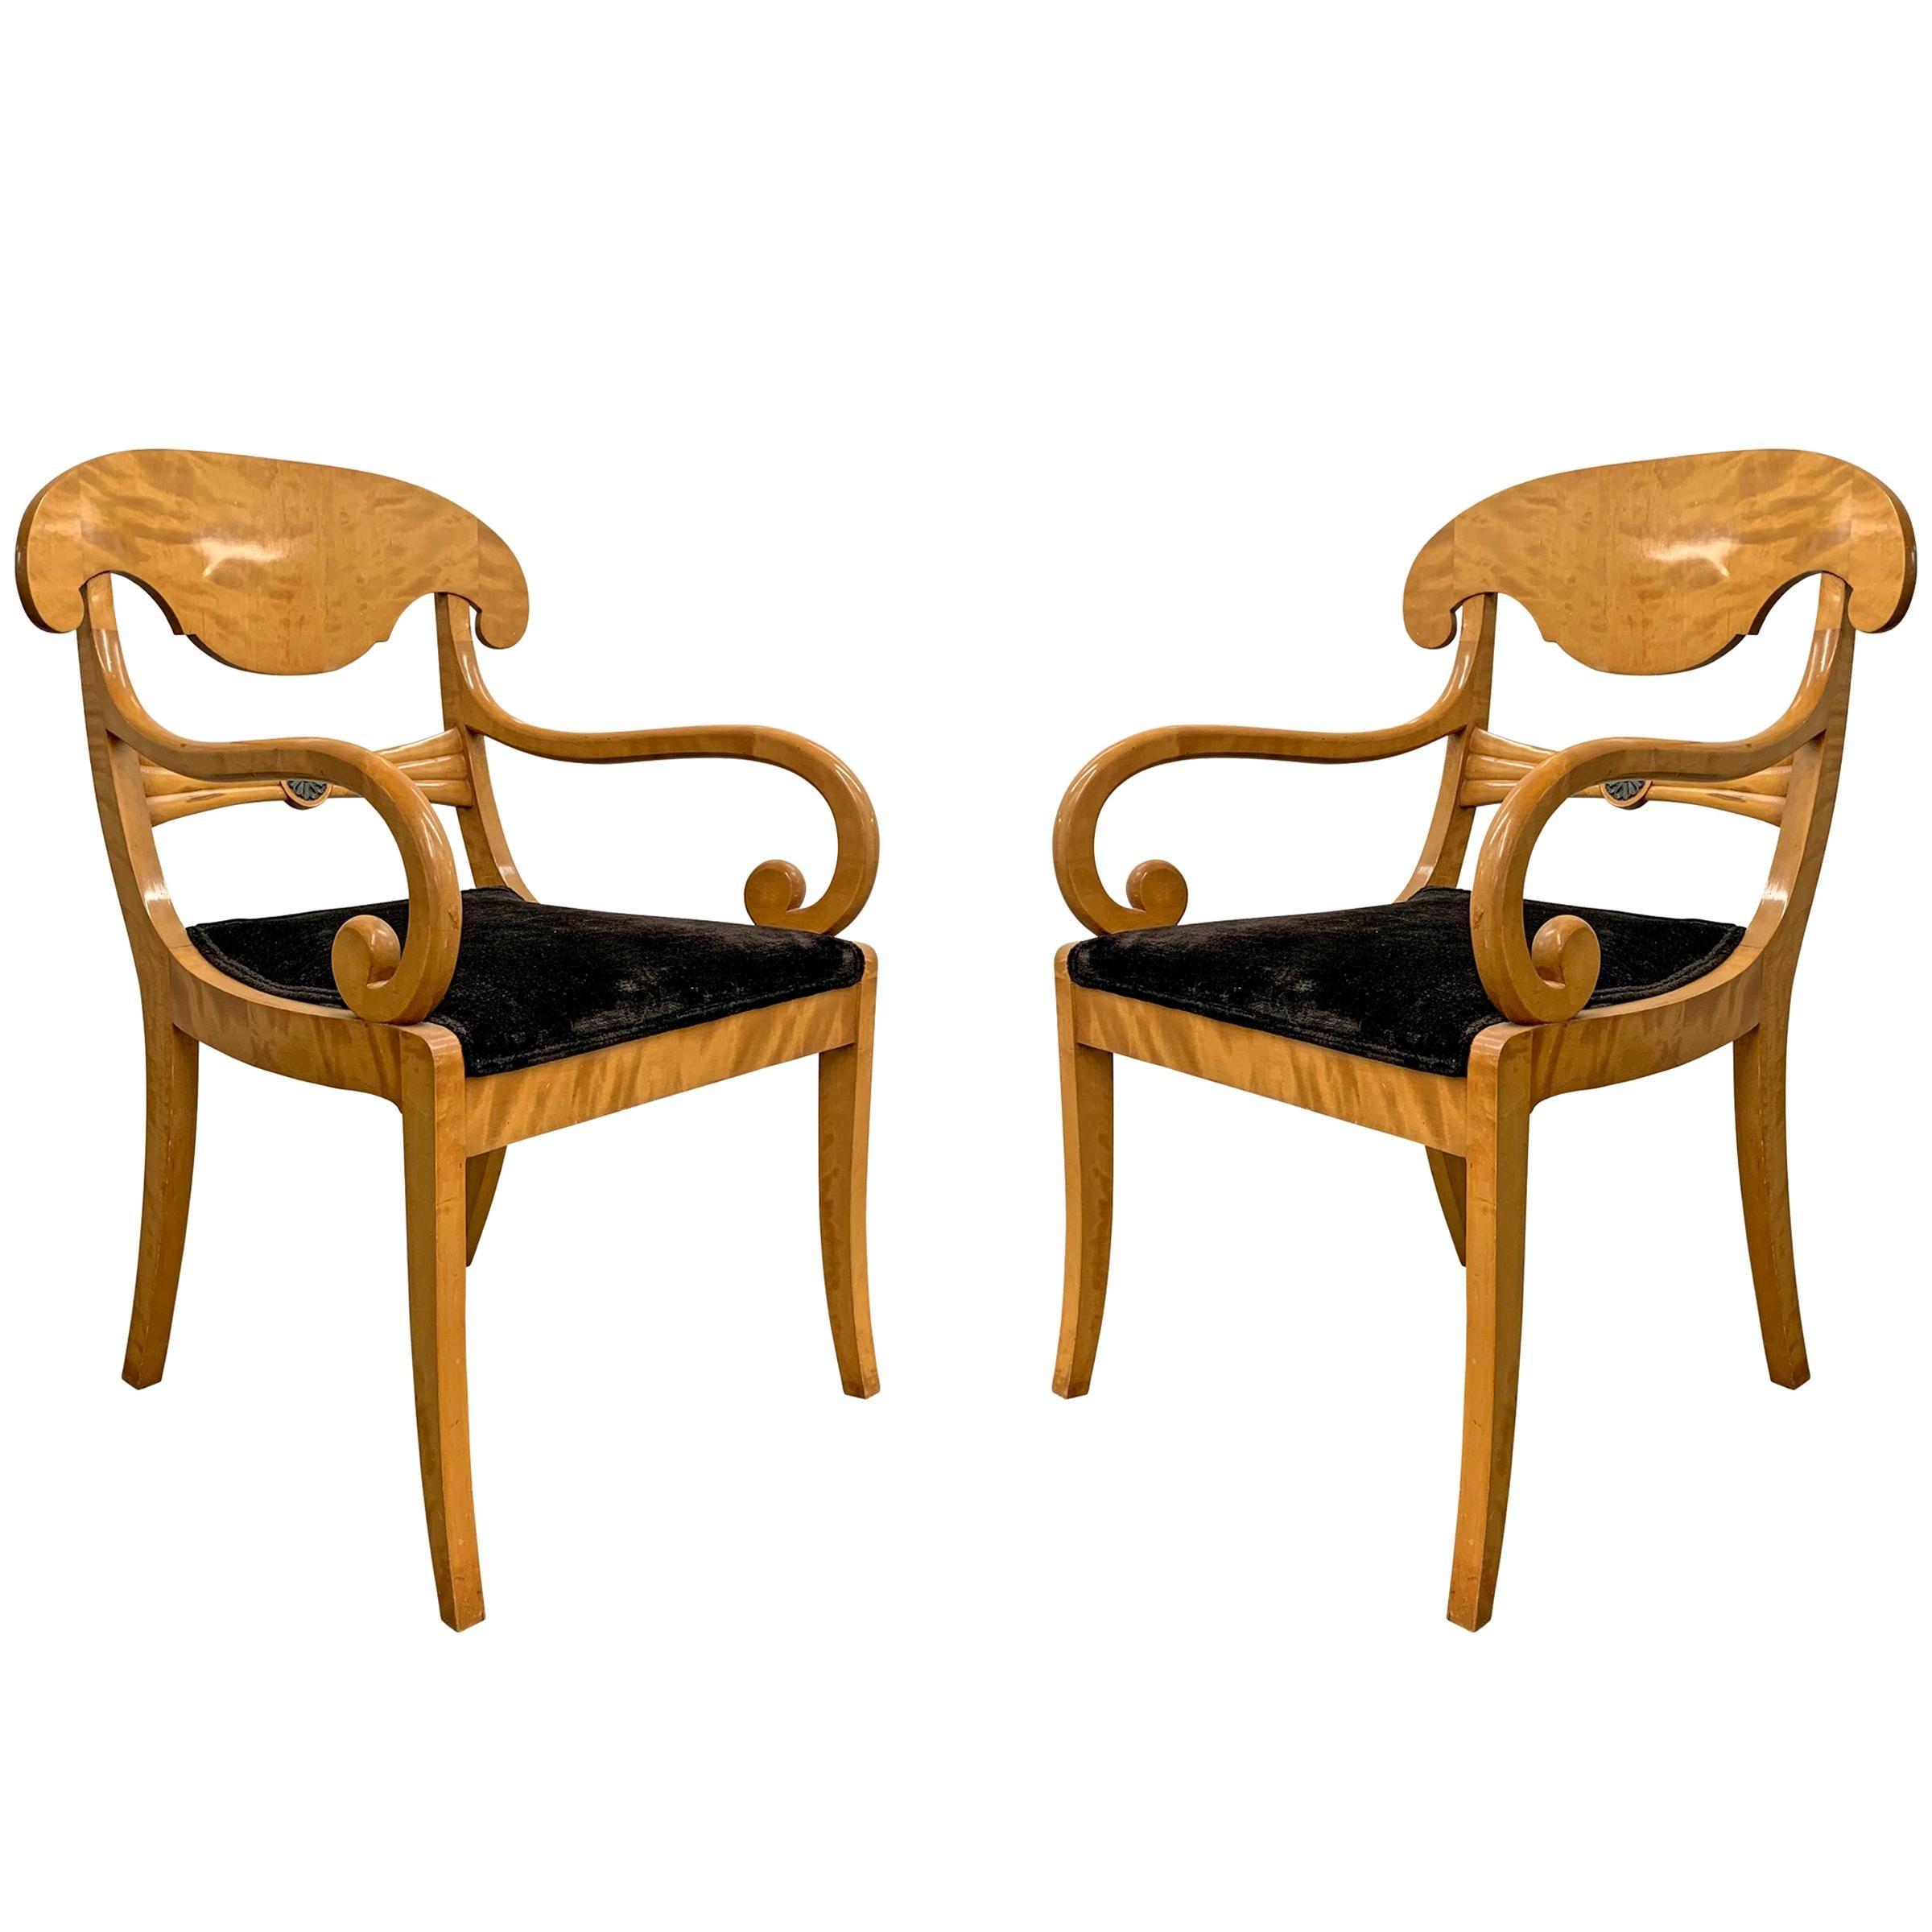 Pair of 19th Century Swedish Karl Johan Chairs